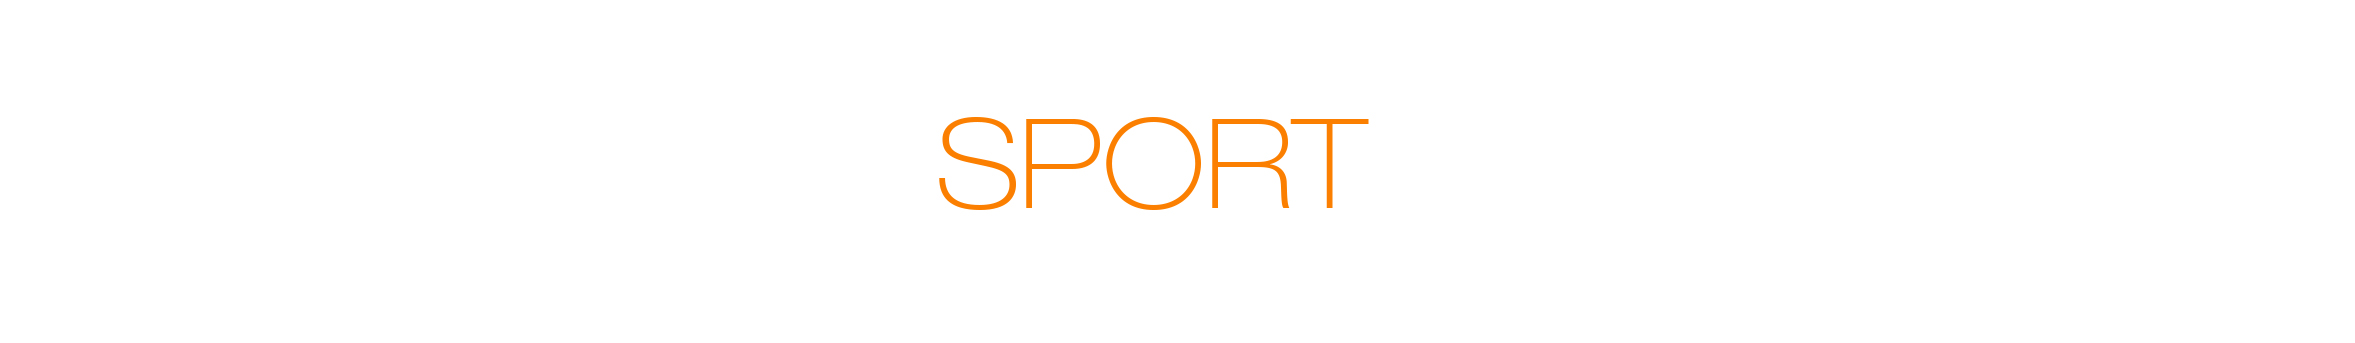 Sport - 1 - Title.jpg